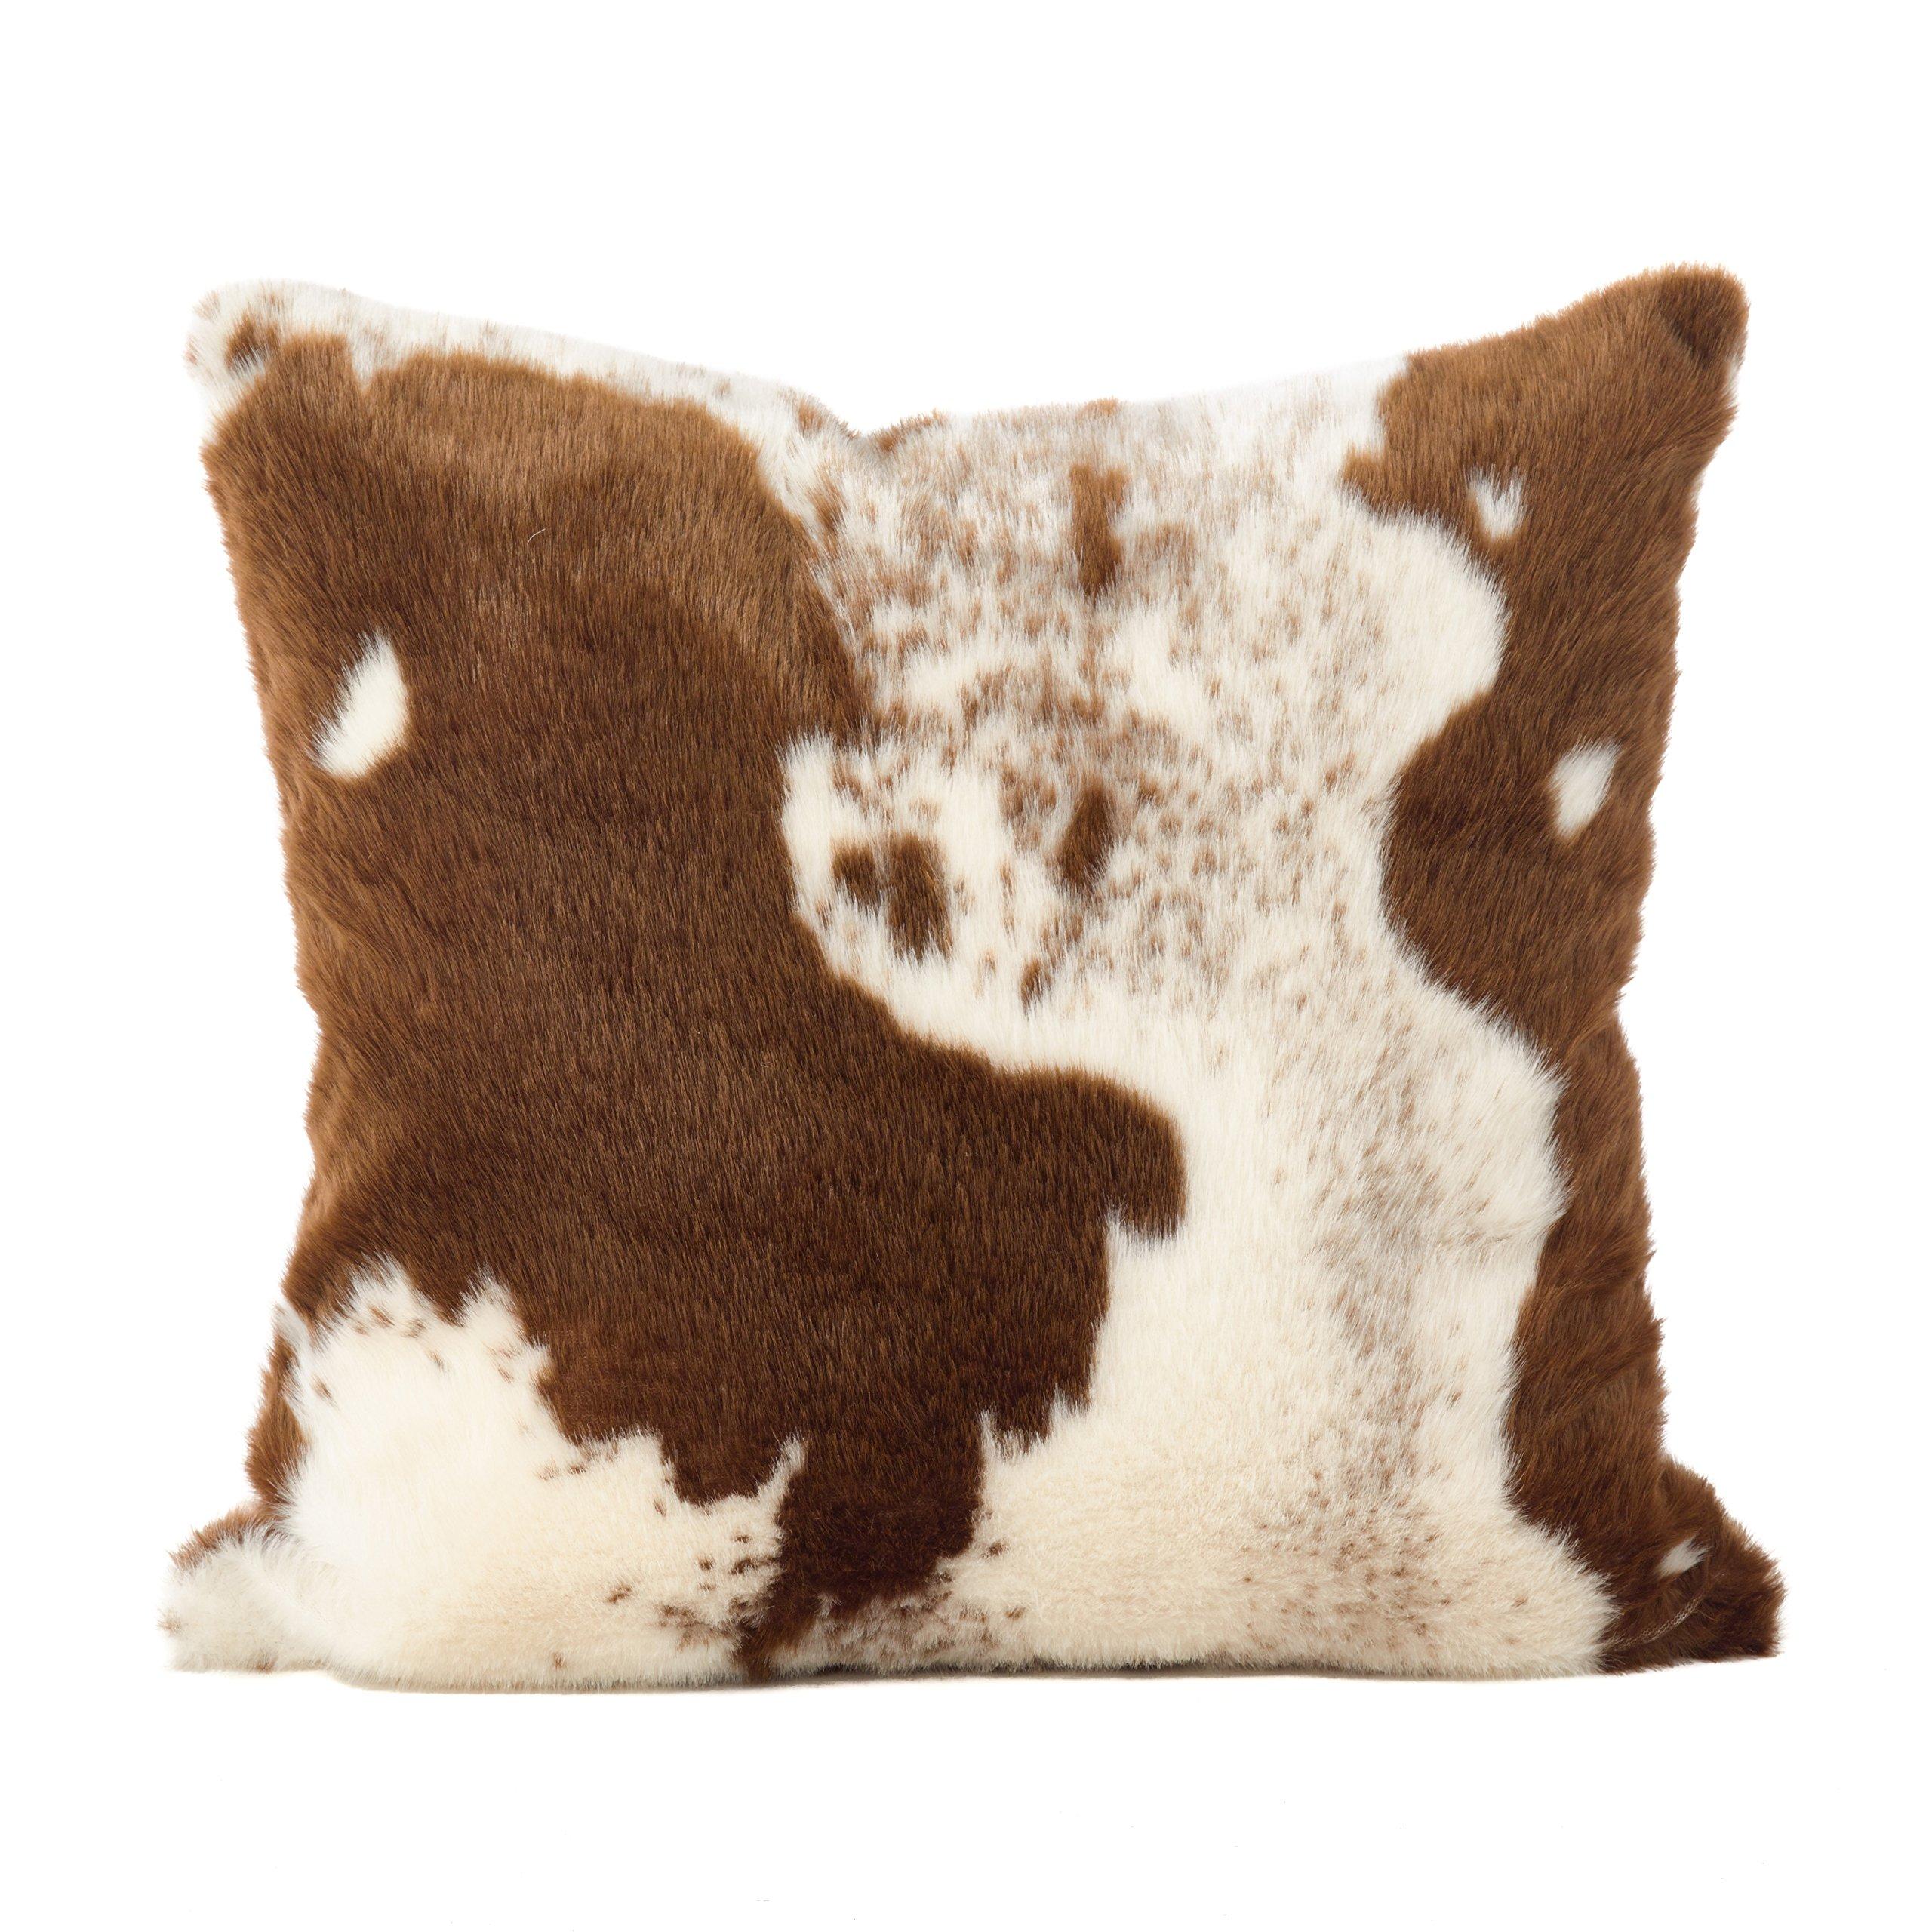 SARO LIFESTYLE Lait Design Urban Faux Cowhide Poly Filled Pillow, 18'', Brown